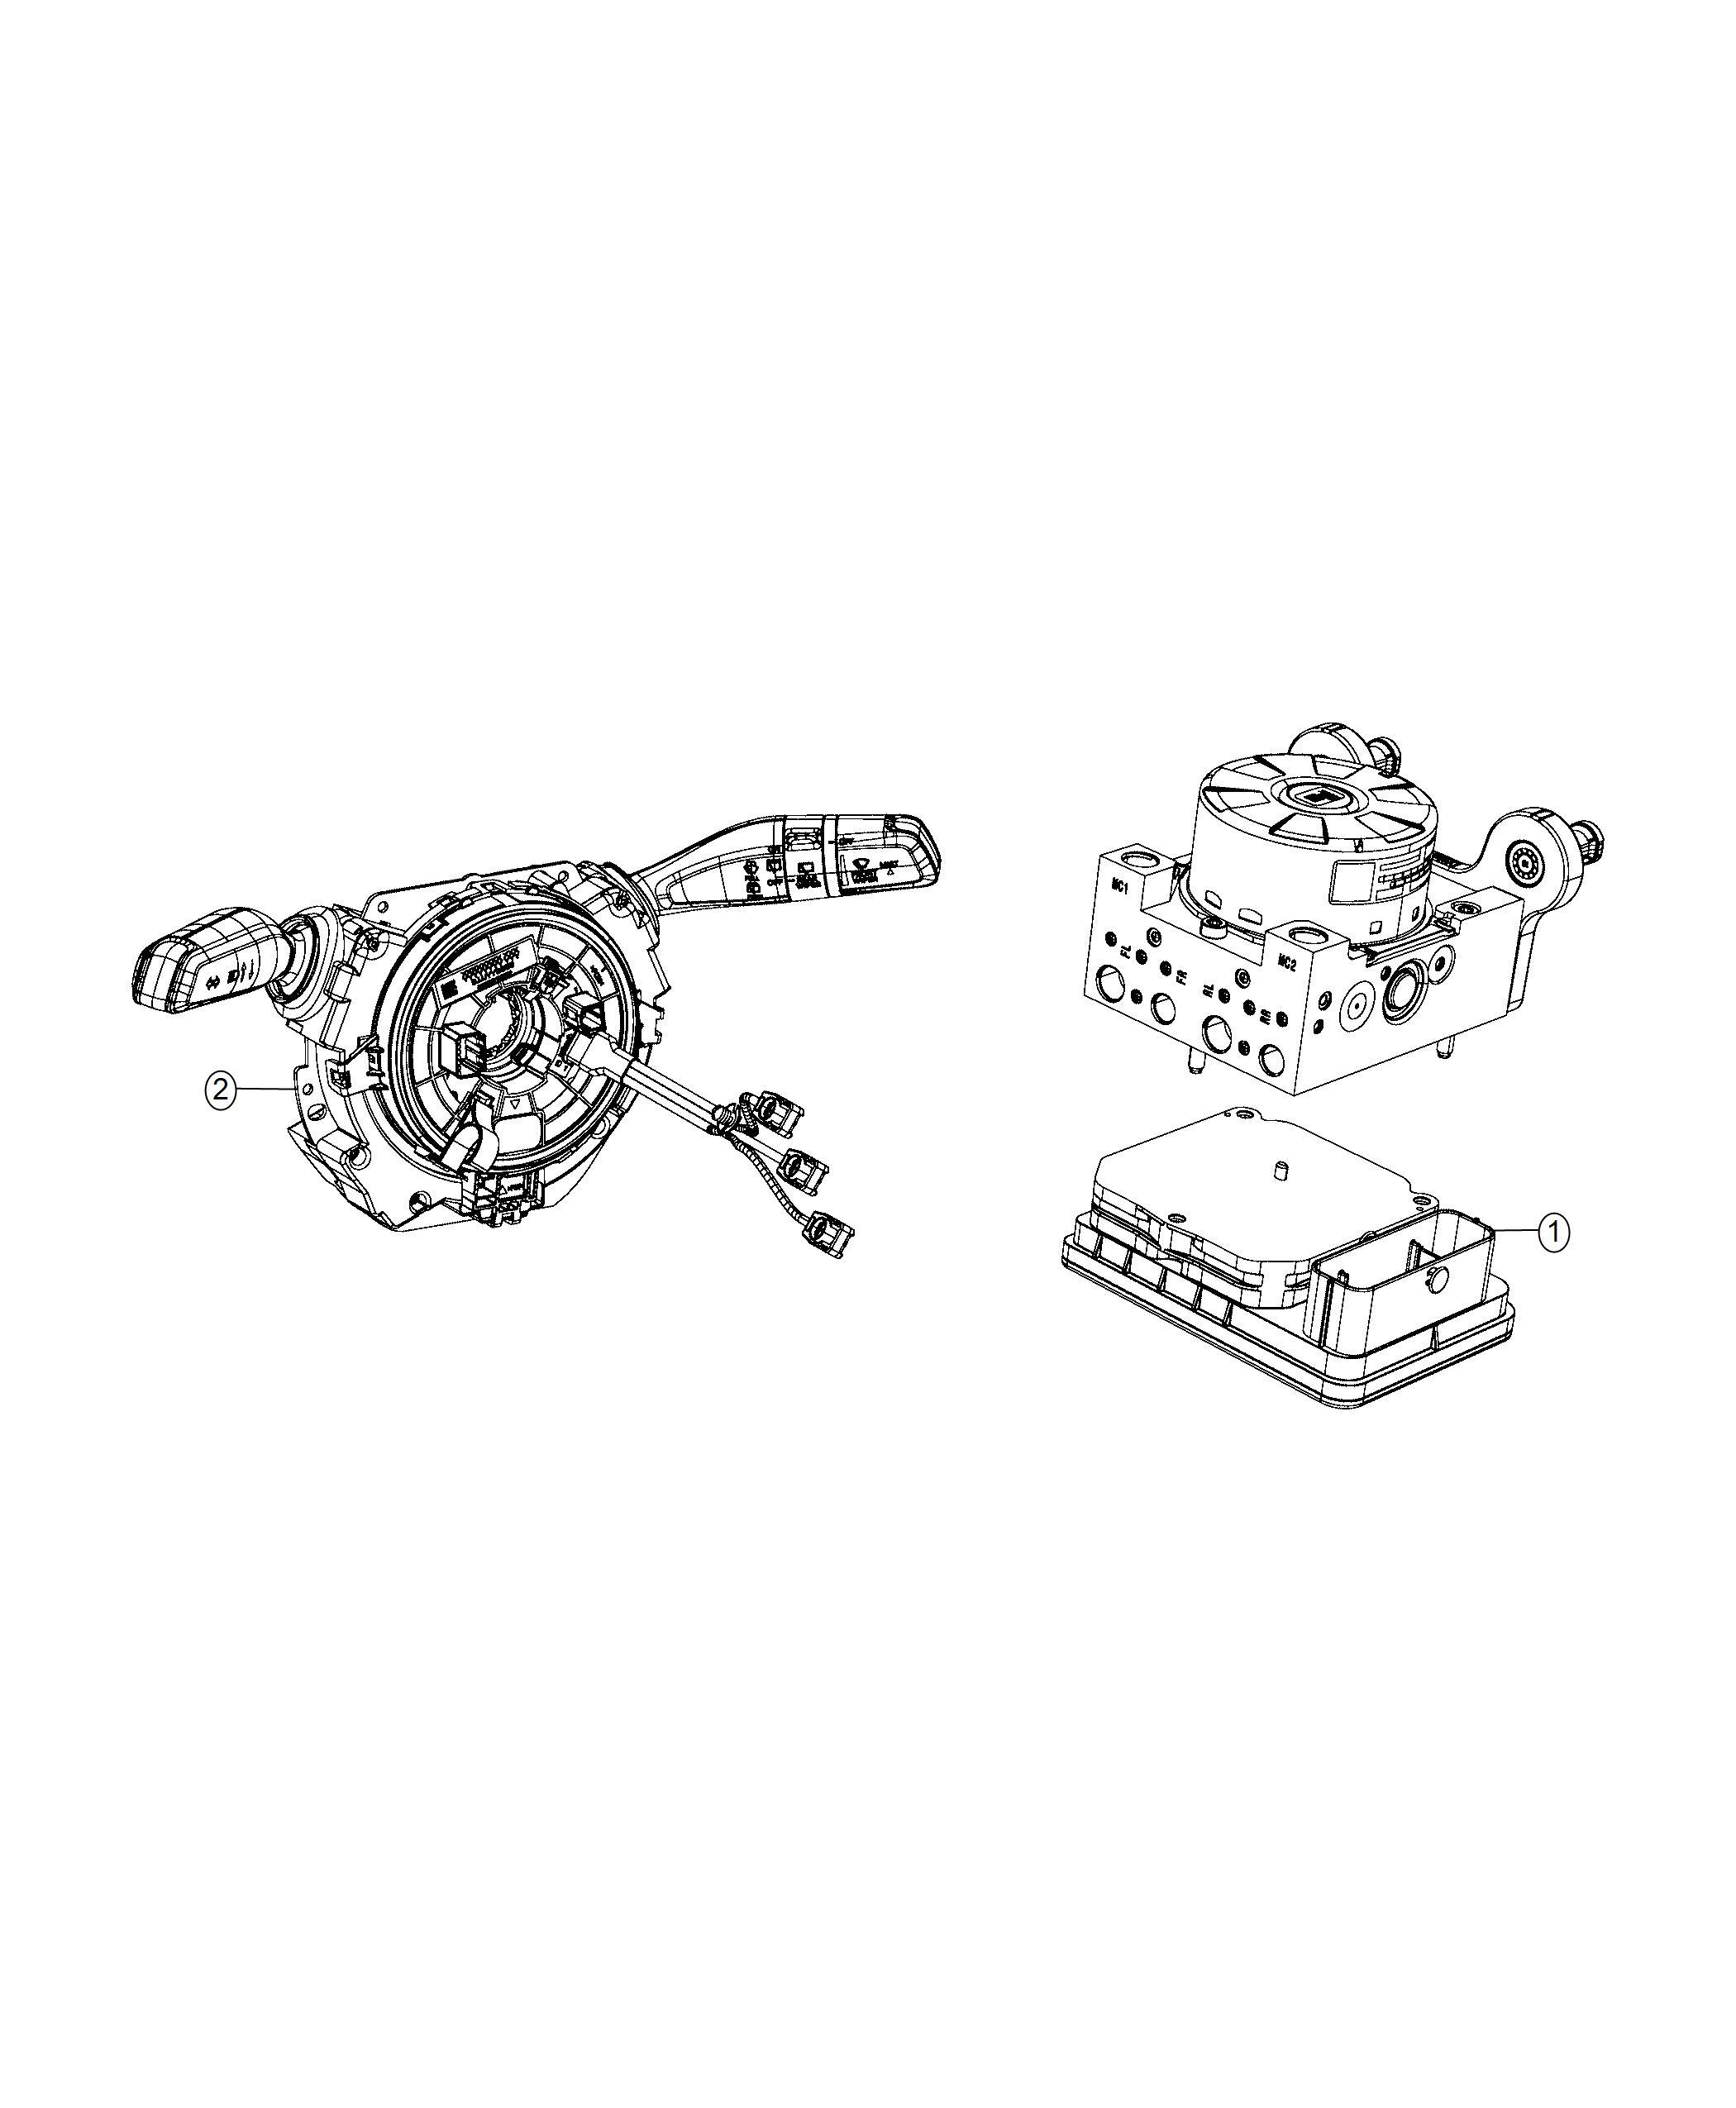 2018 Jeep Wrangler Module. Steering column. [instrument